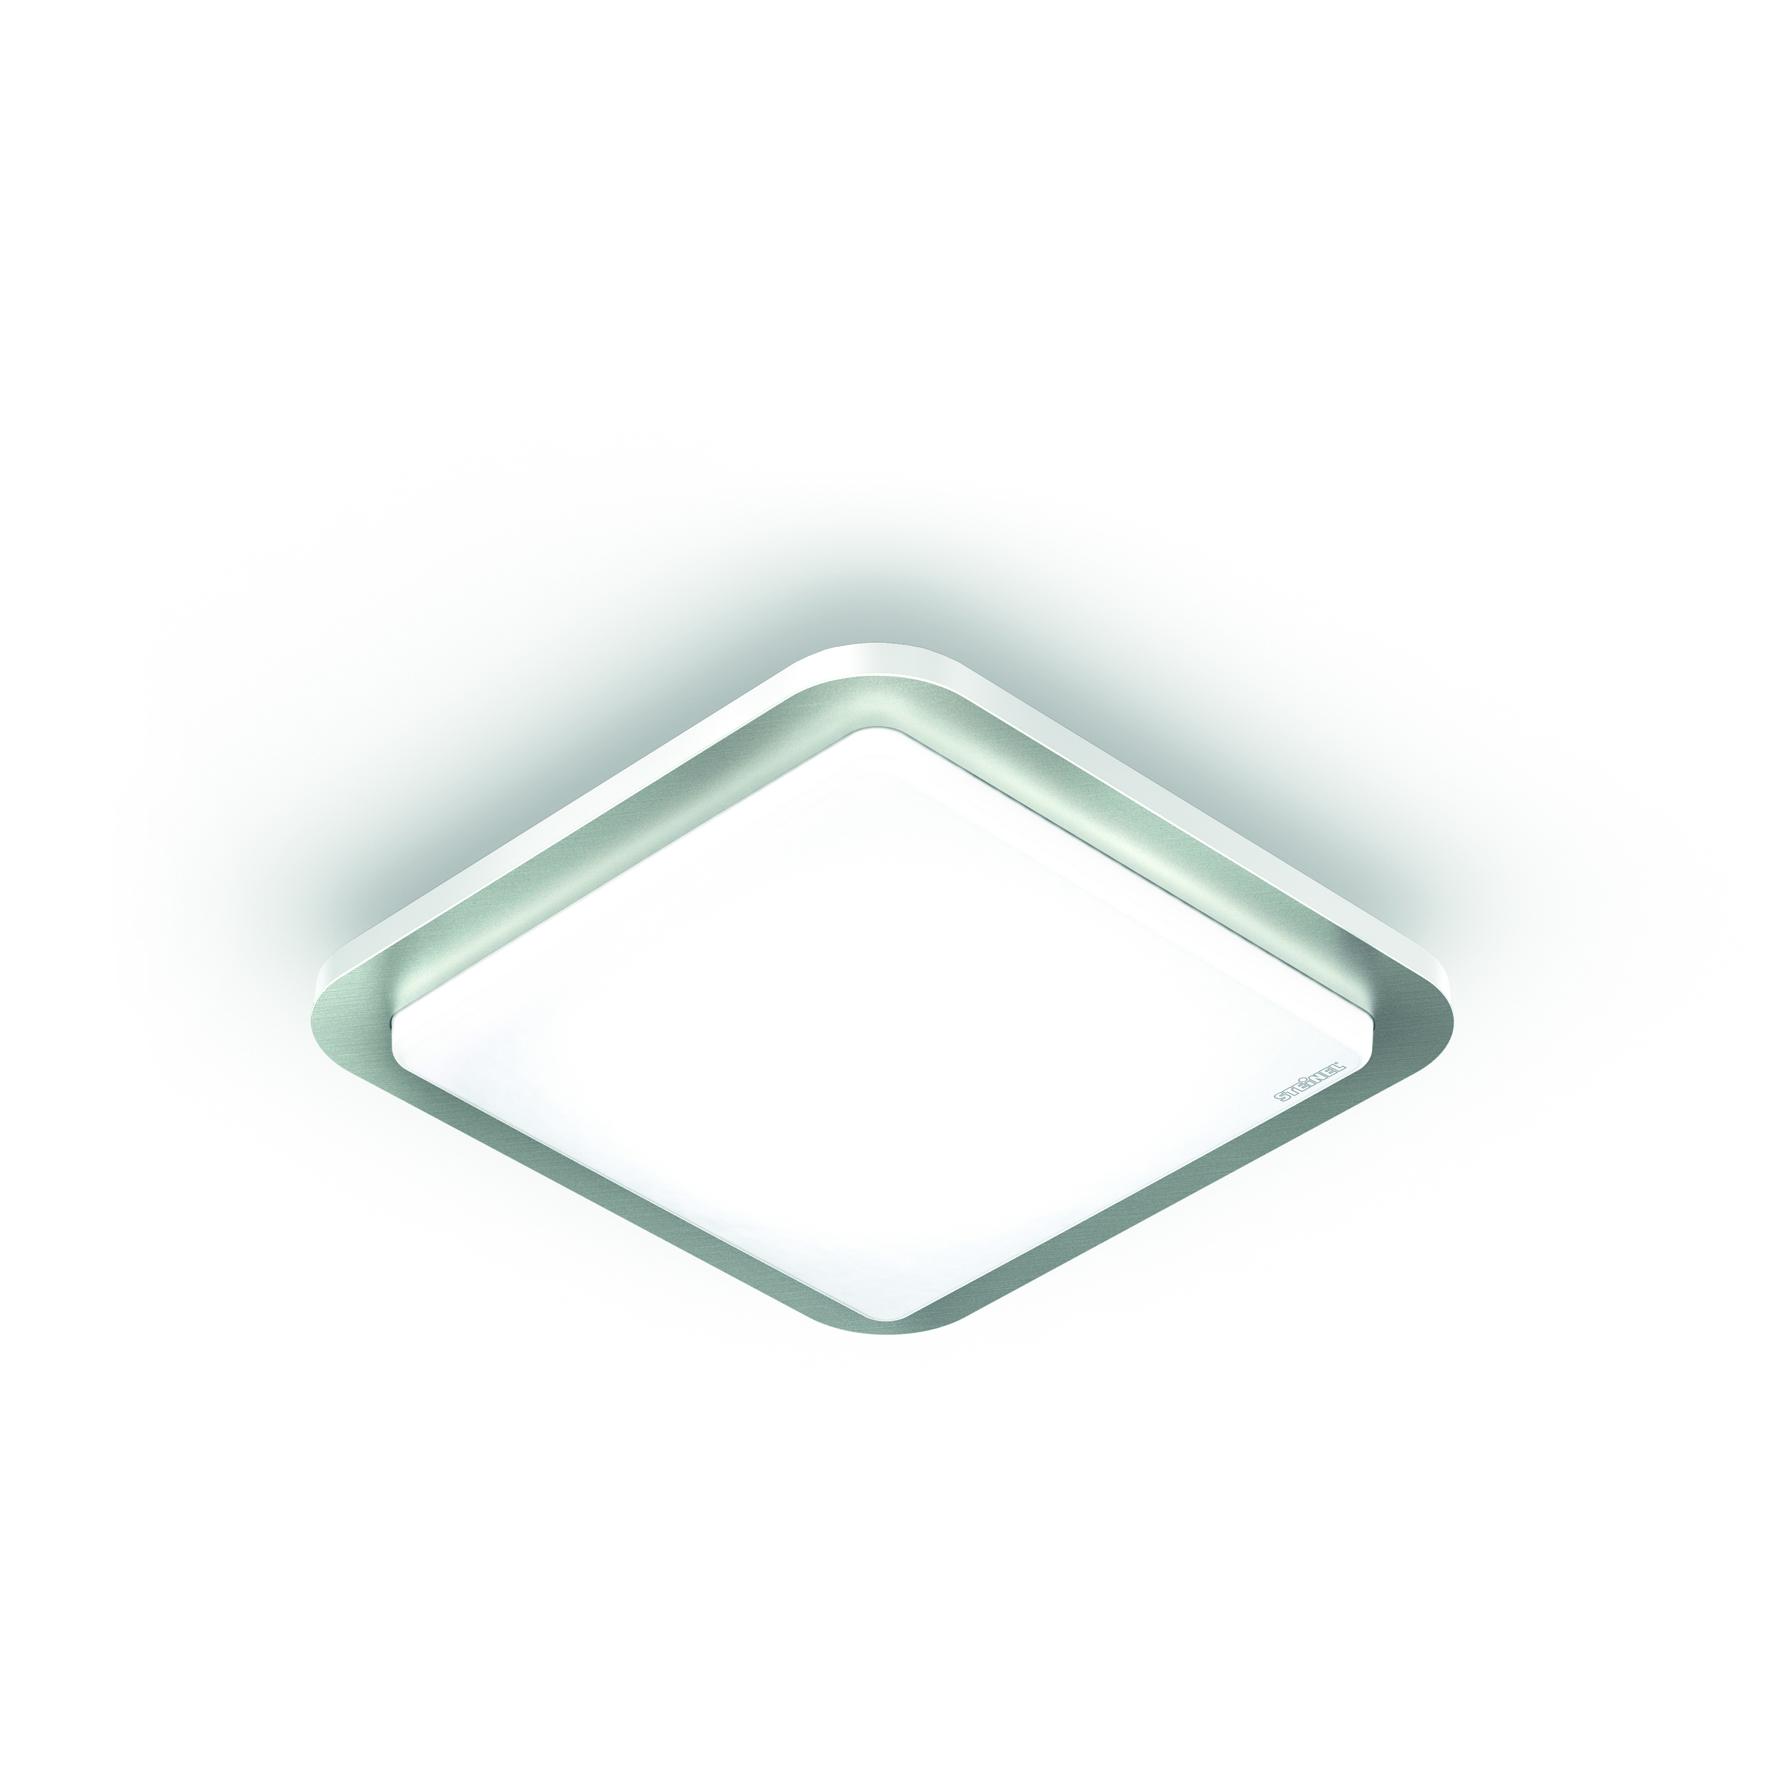 steinel sensorleuchte rs led d2 evo-007928